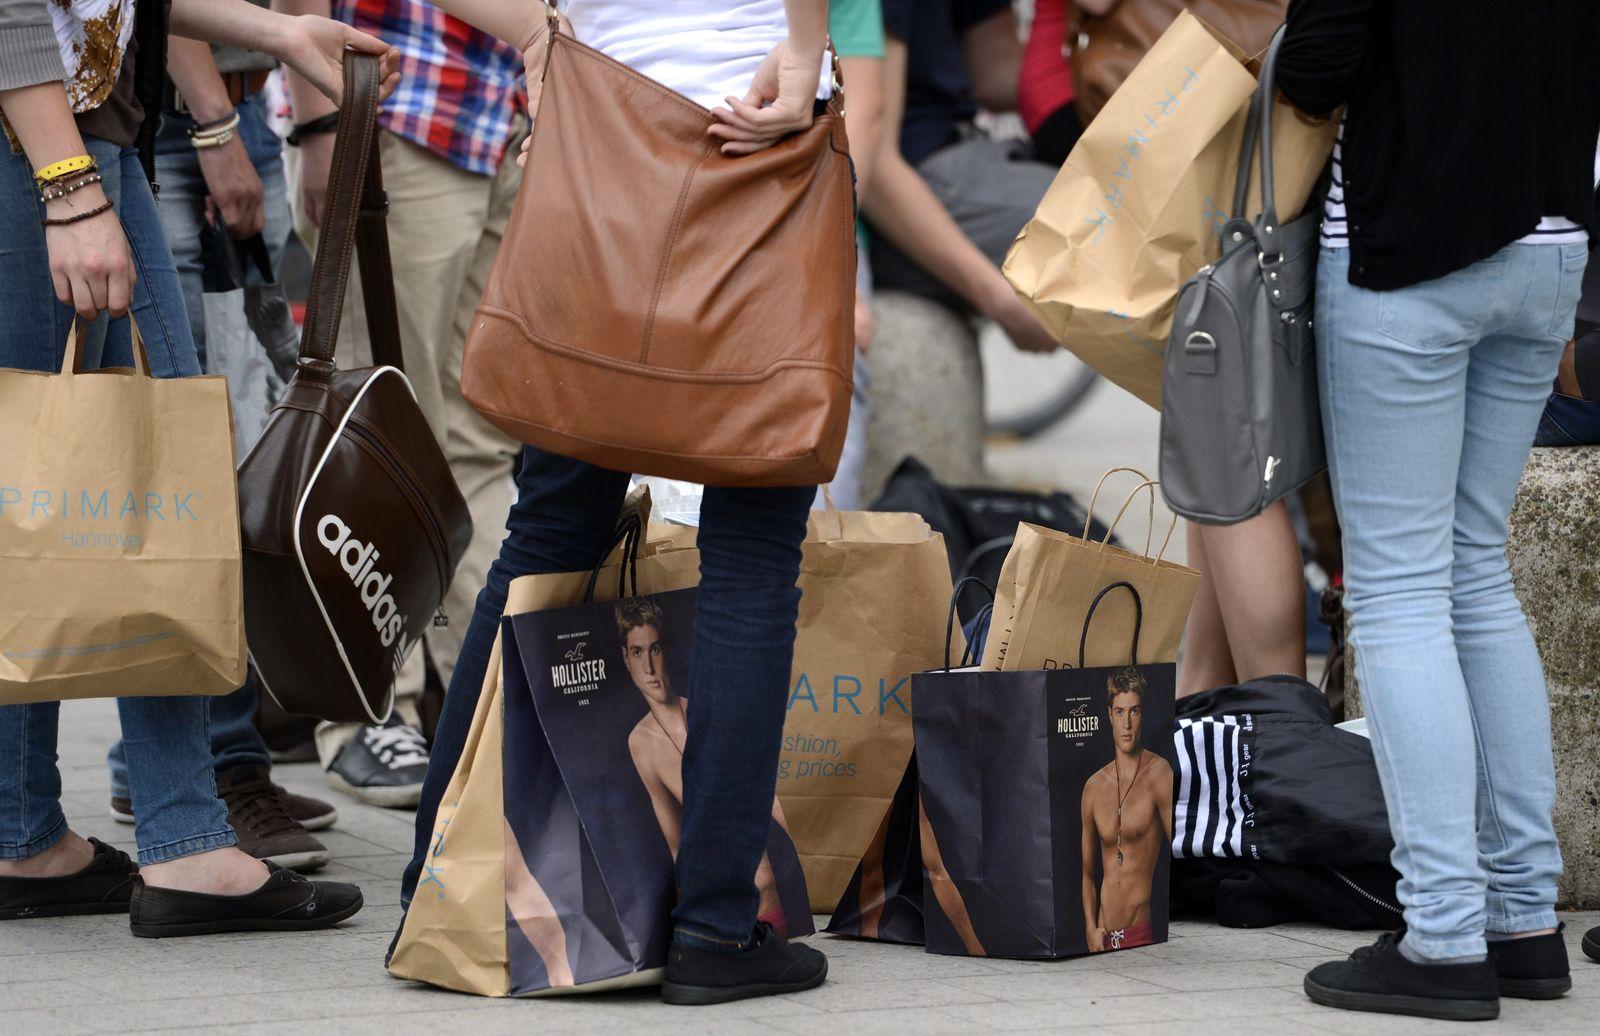 Konsum Verbraucher Kauflaune